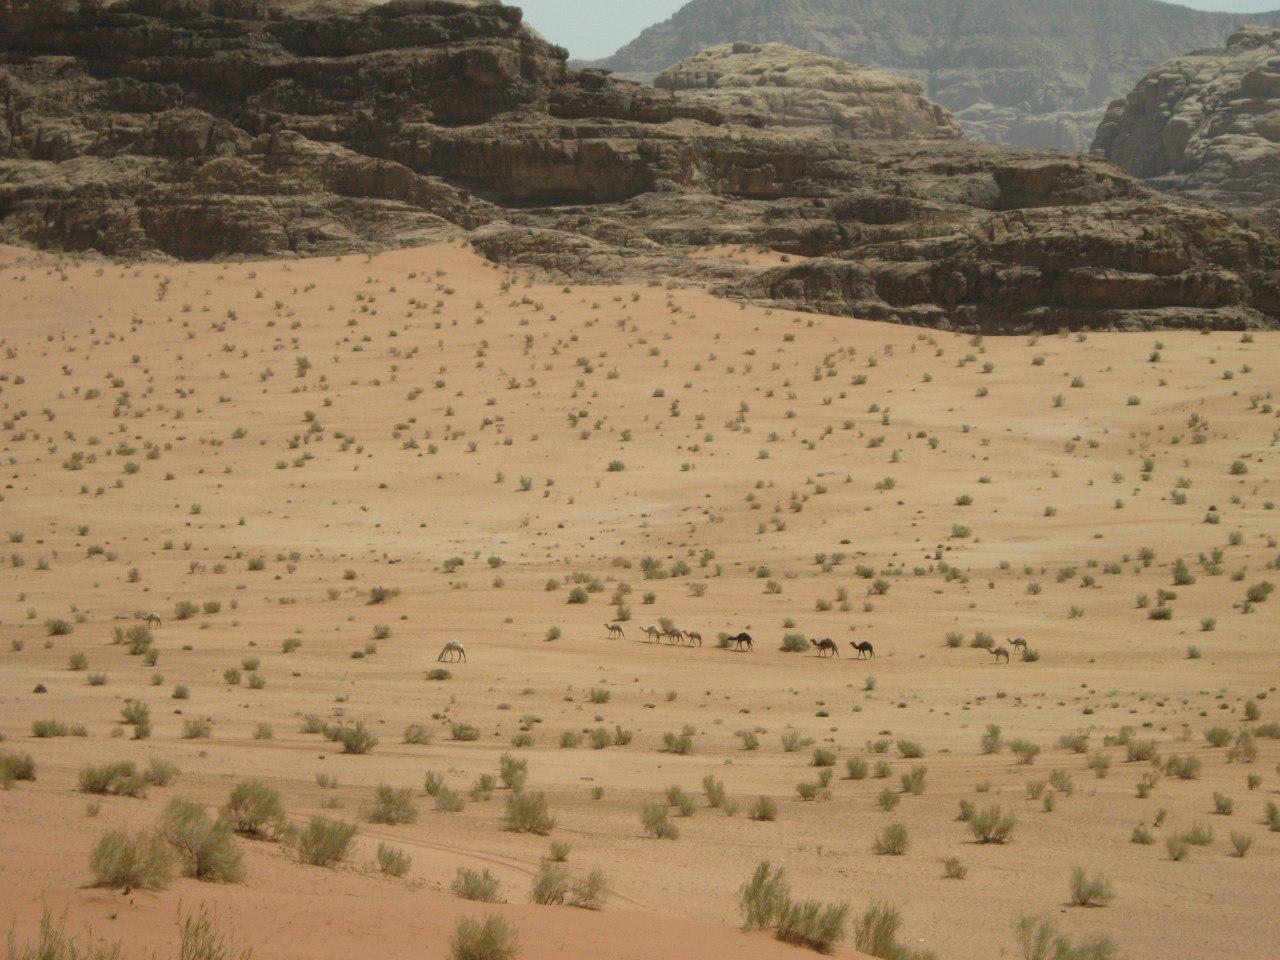 караван верблюдов в Вади Рам